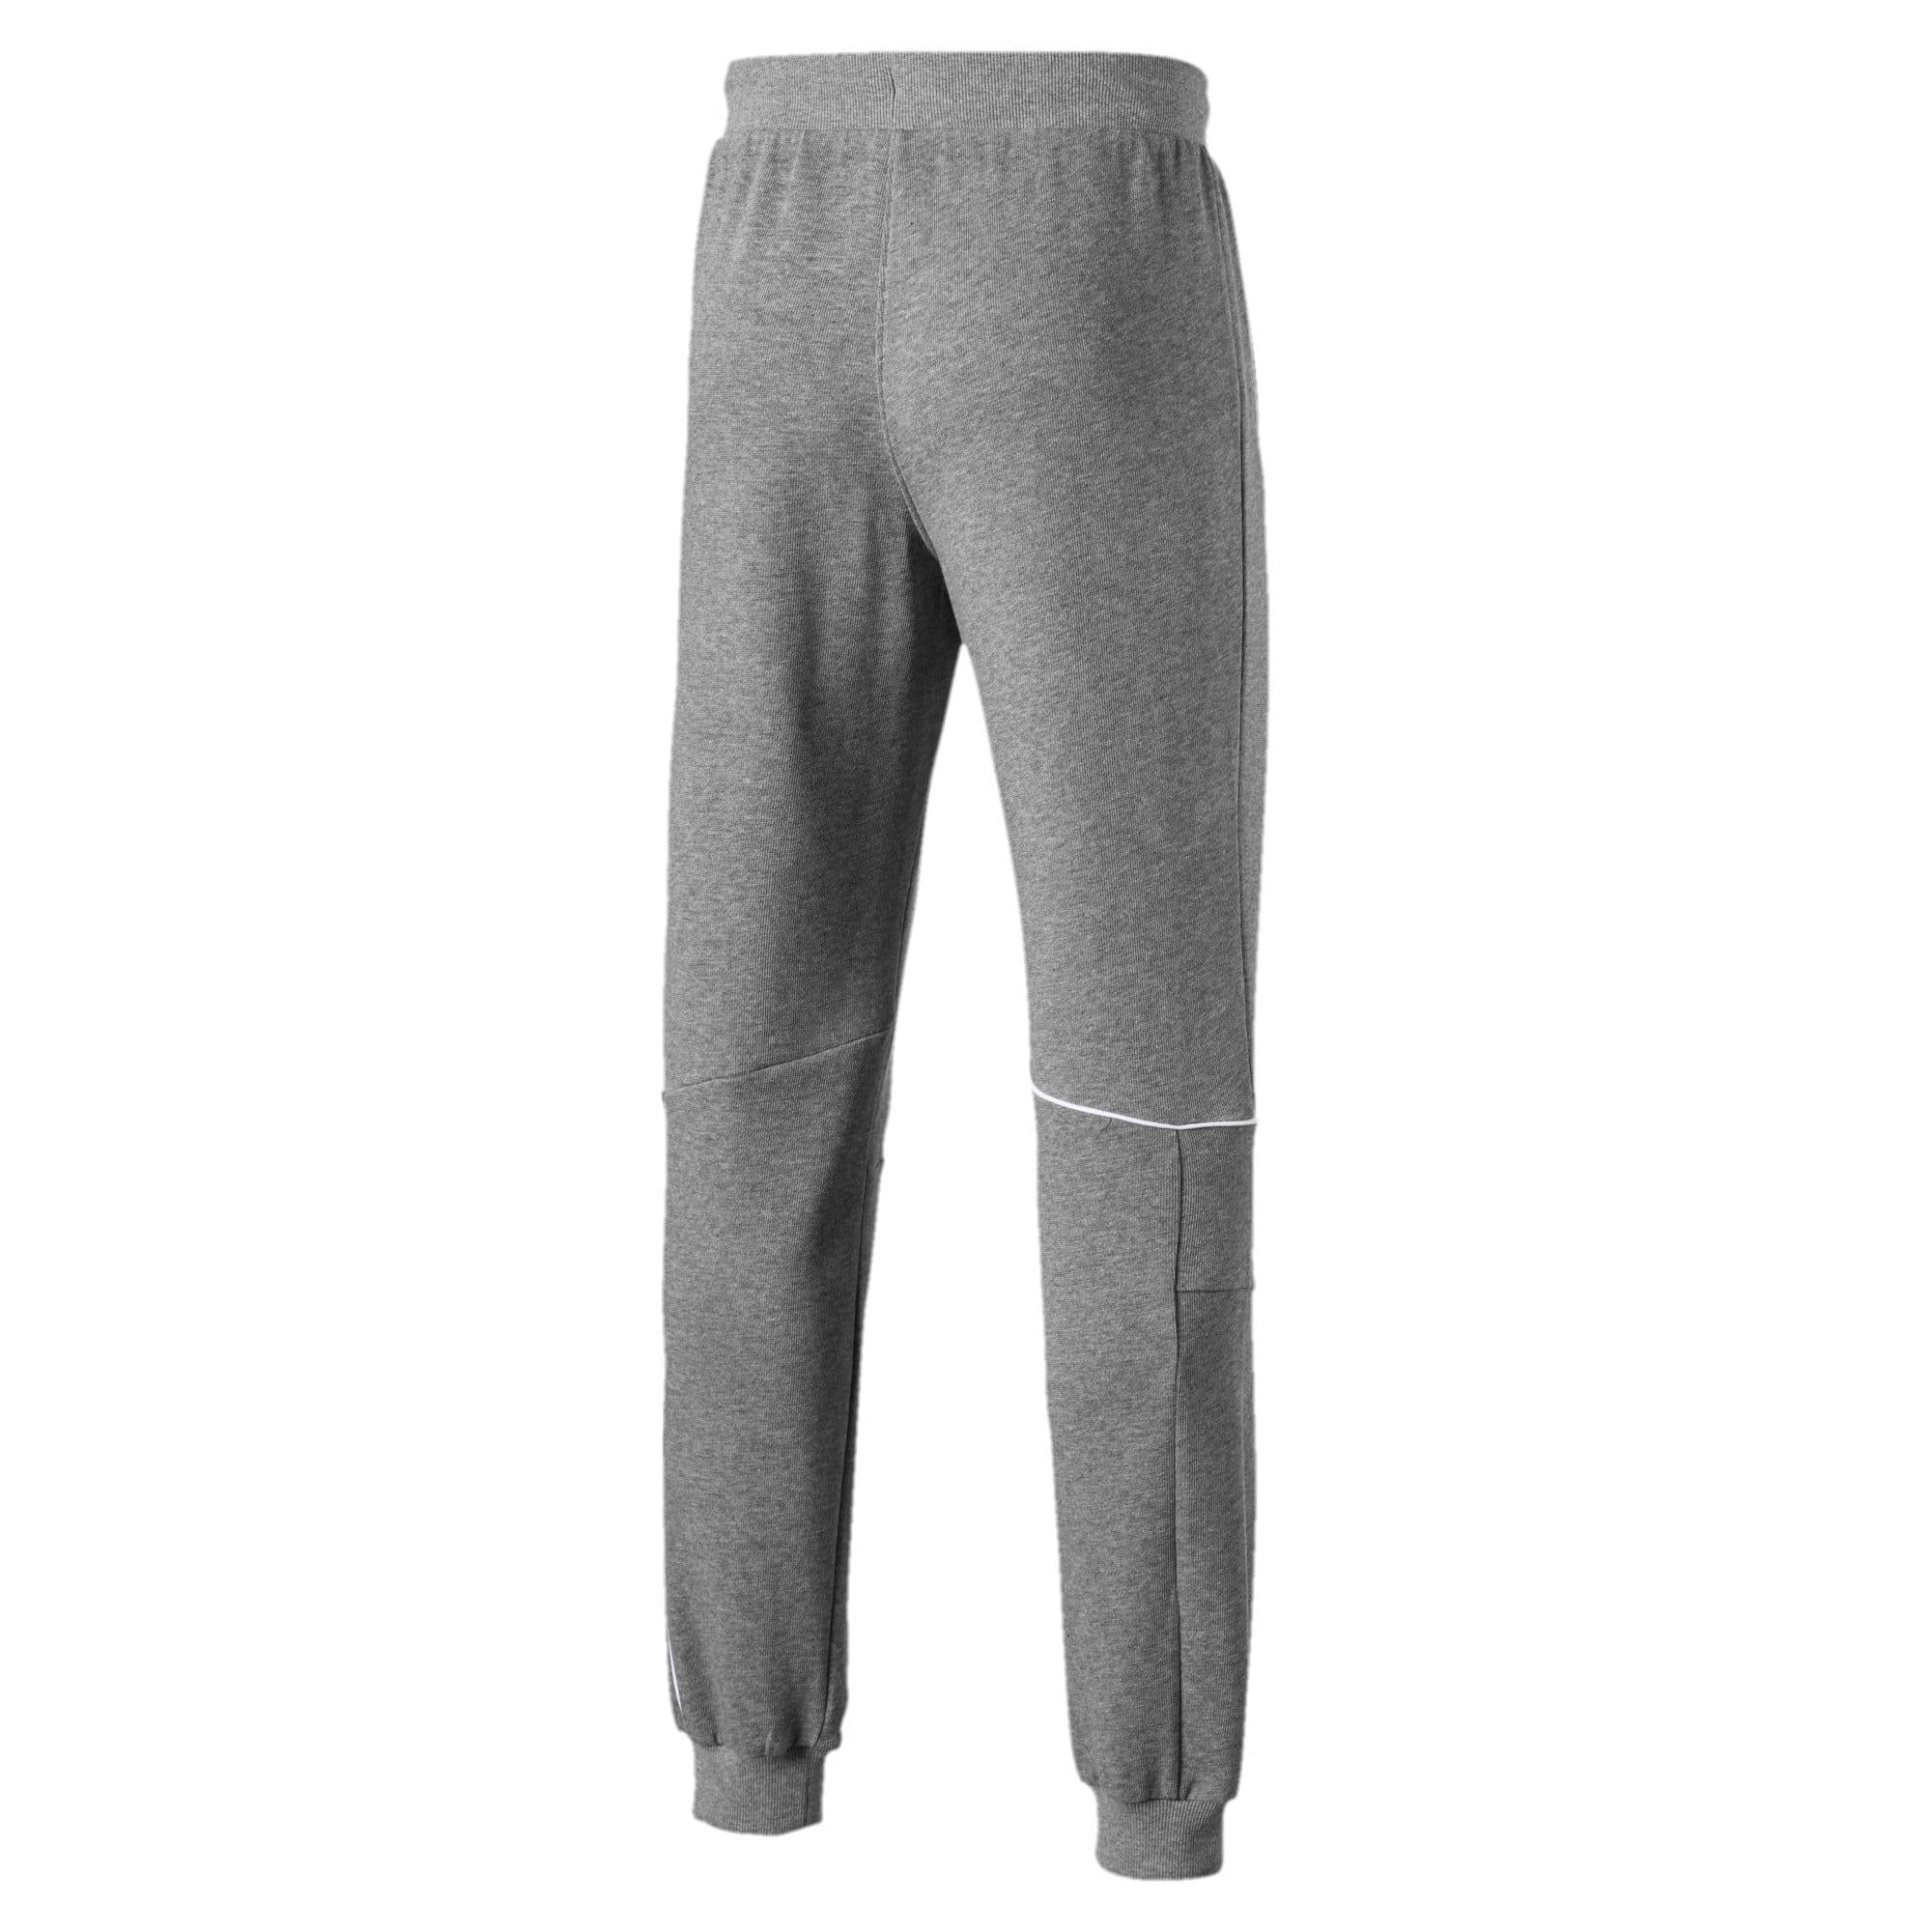 Thumbnail 5 of Ferrari Knitted Men's Sweatpants, Medium Gray Heather, medium-IND